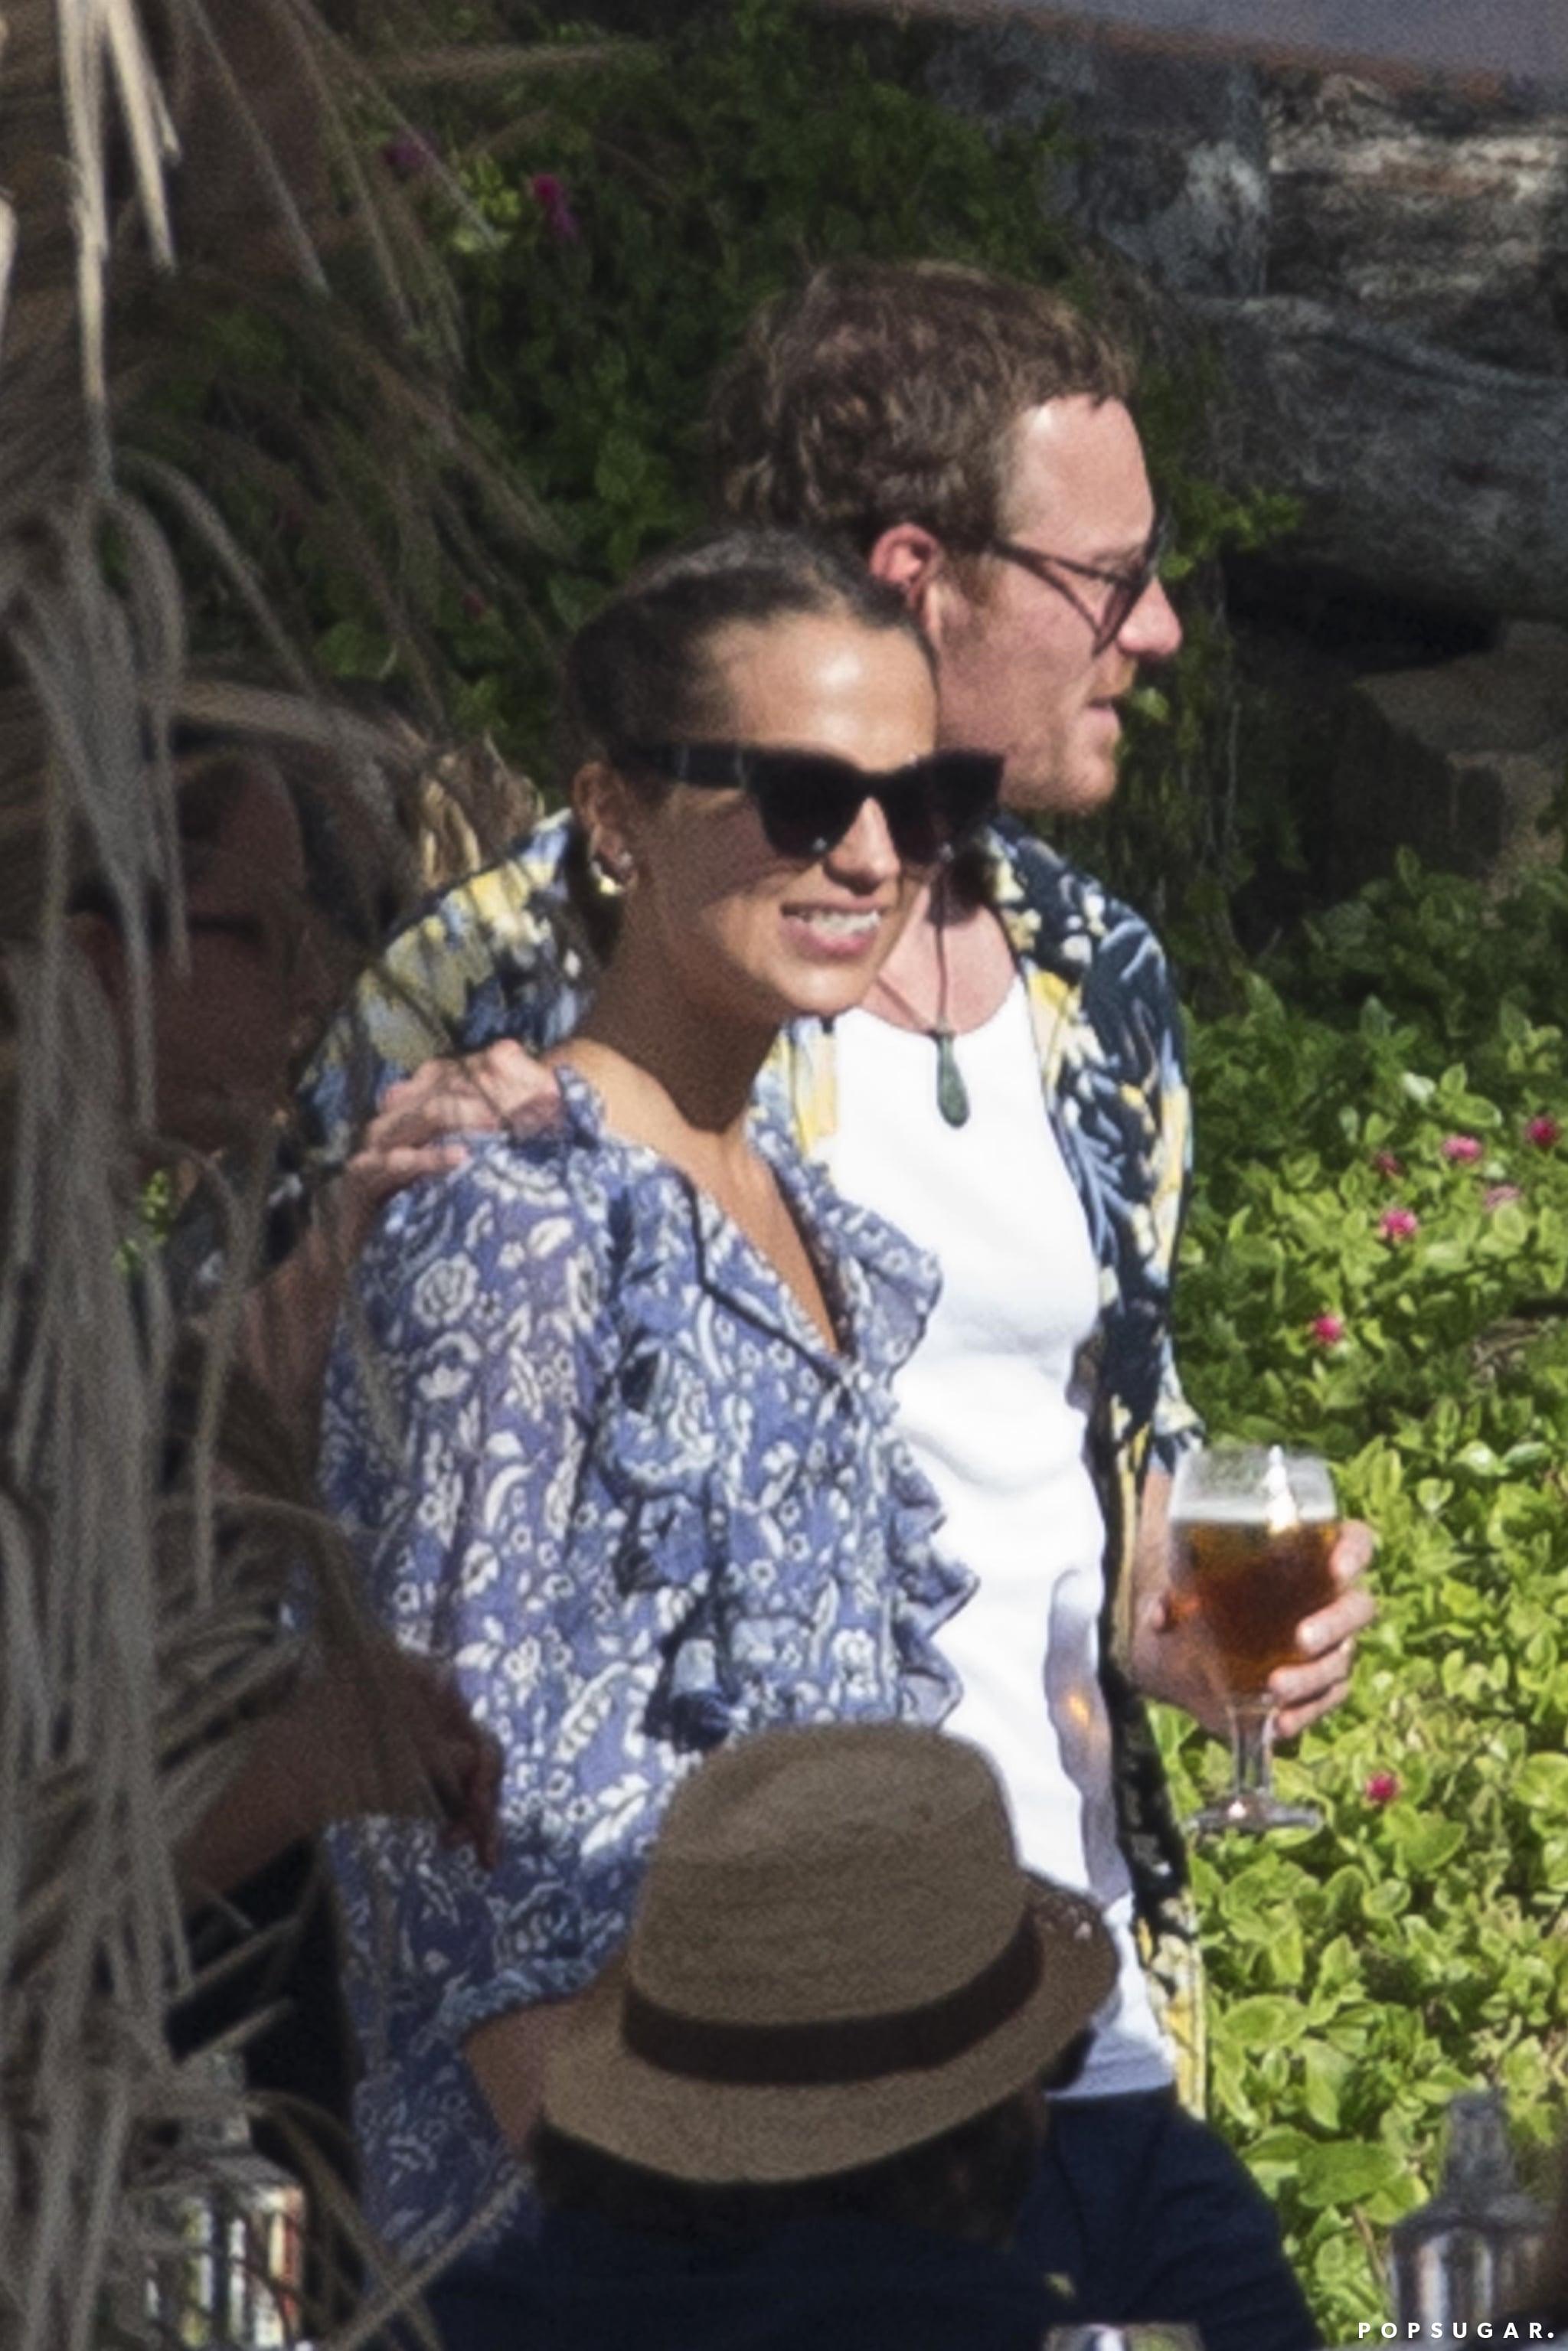 Michael Fassbender And Alicia Vikander In Spain October 2017 Popsugar Celebrity